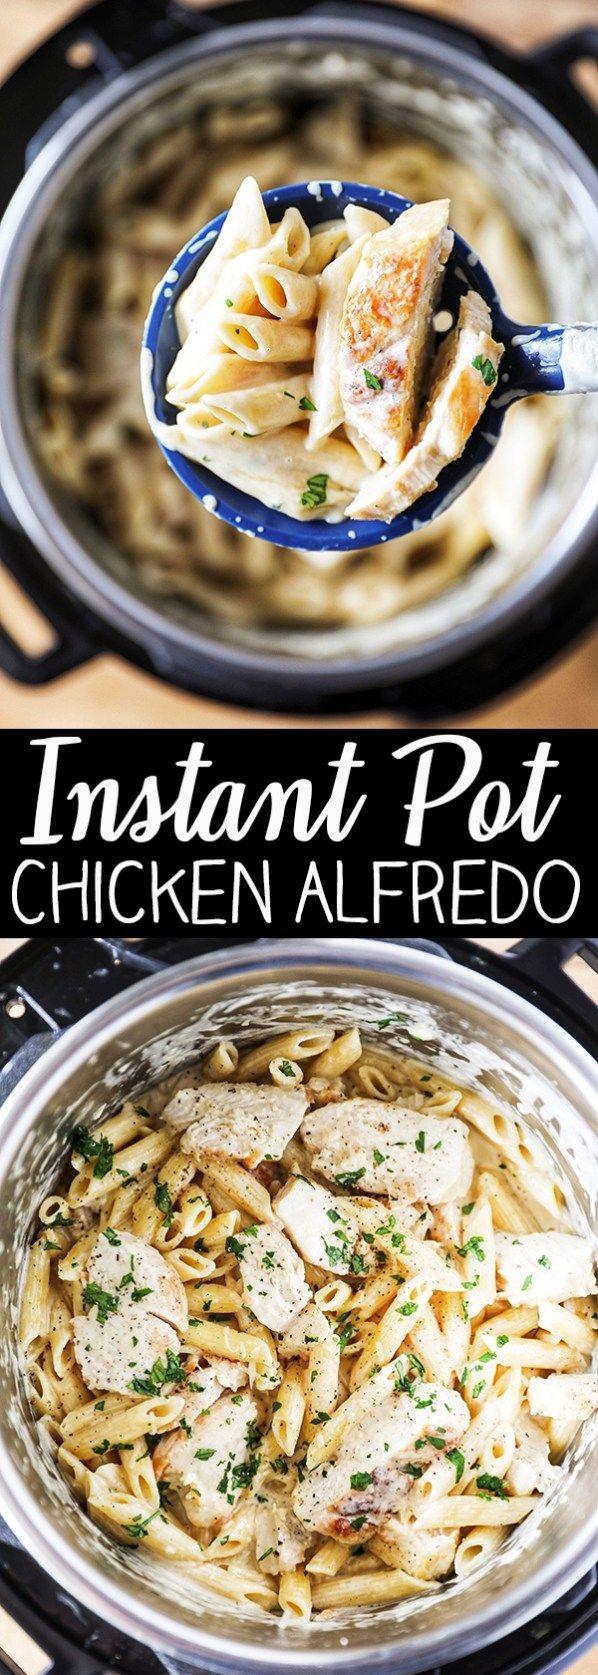 Easy Beginner Instant Pot Recipes images